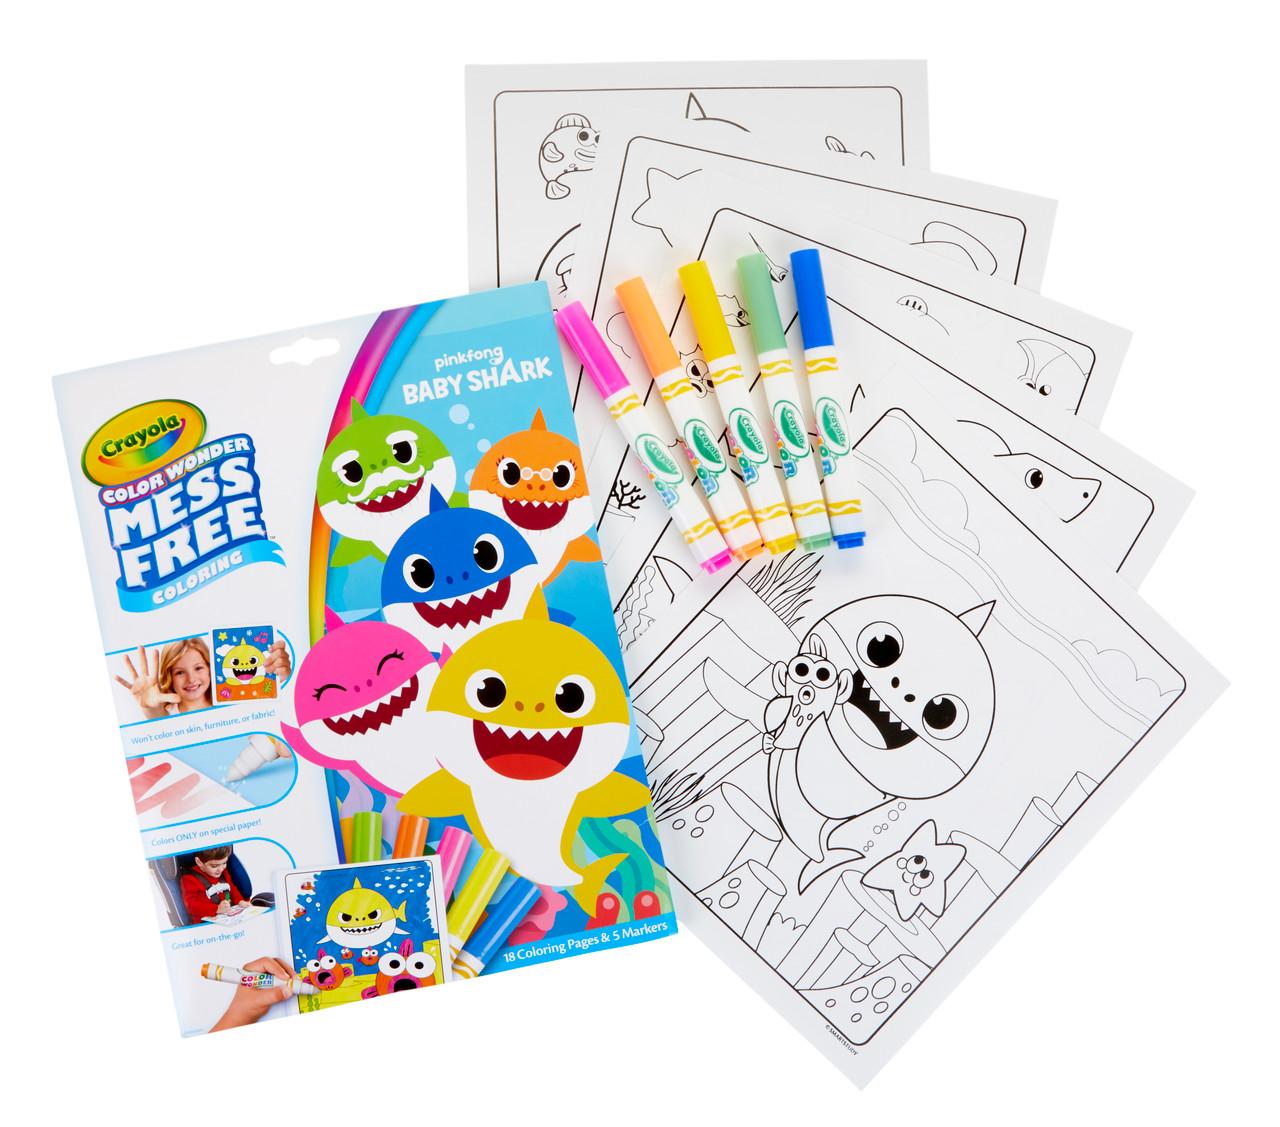 Crayola Color Wonder Mess Free Baby Shark Coloring Set At Toymate Art Craft